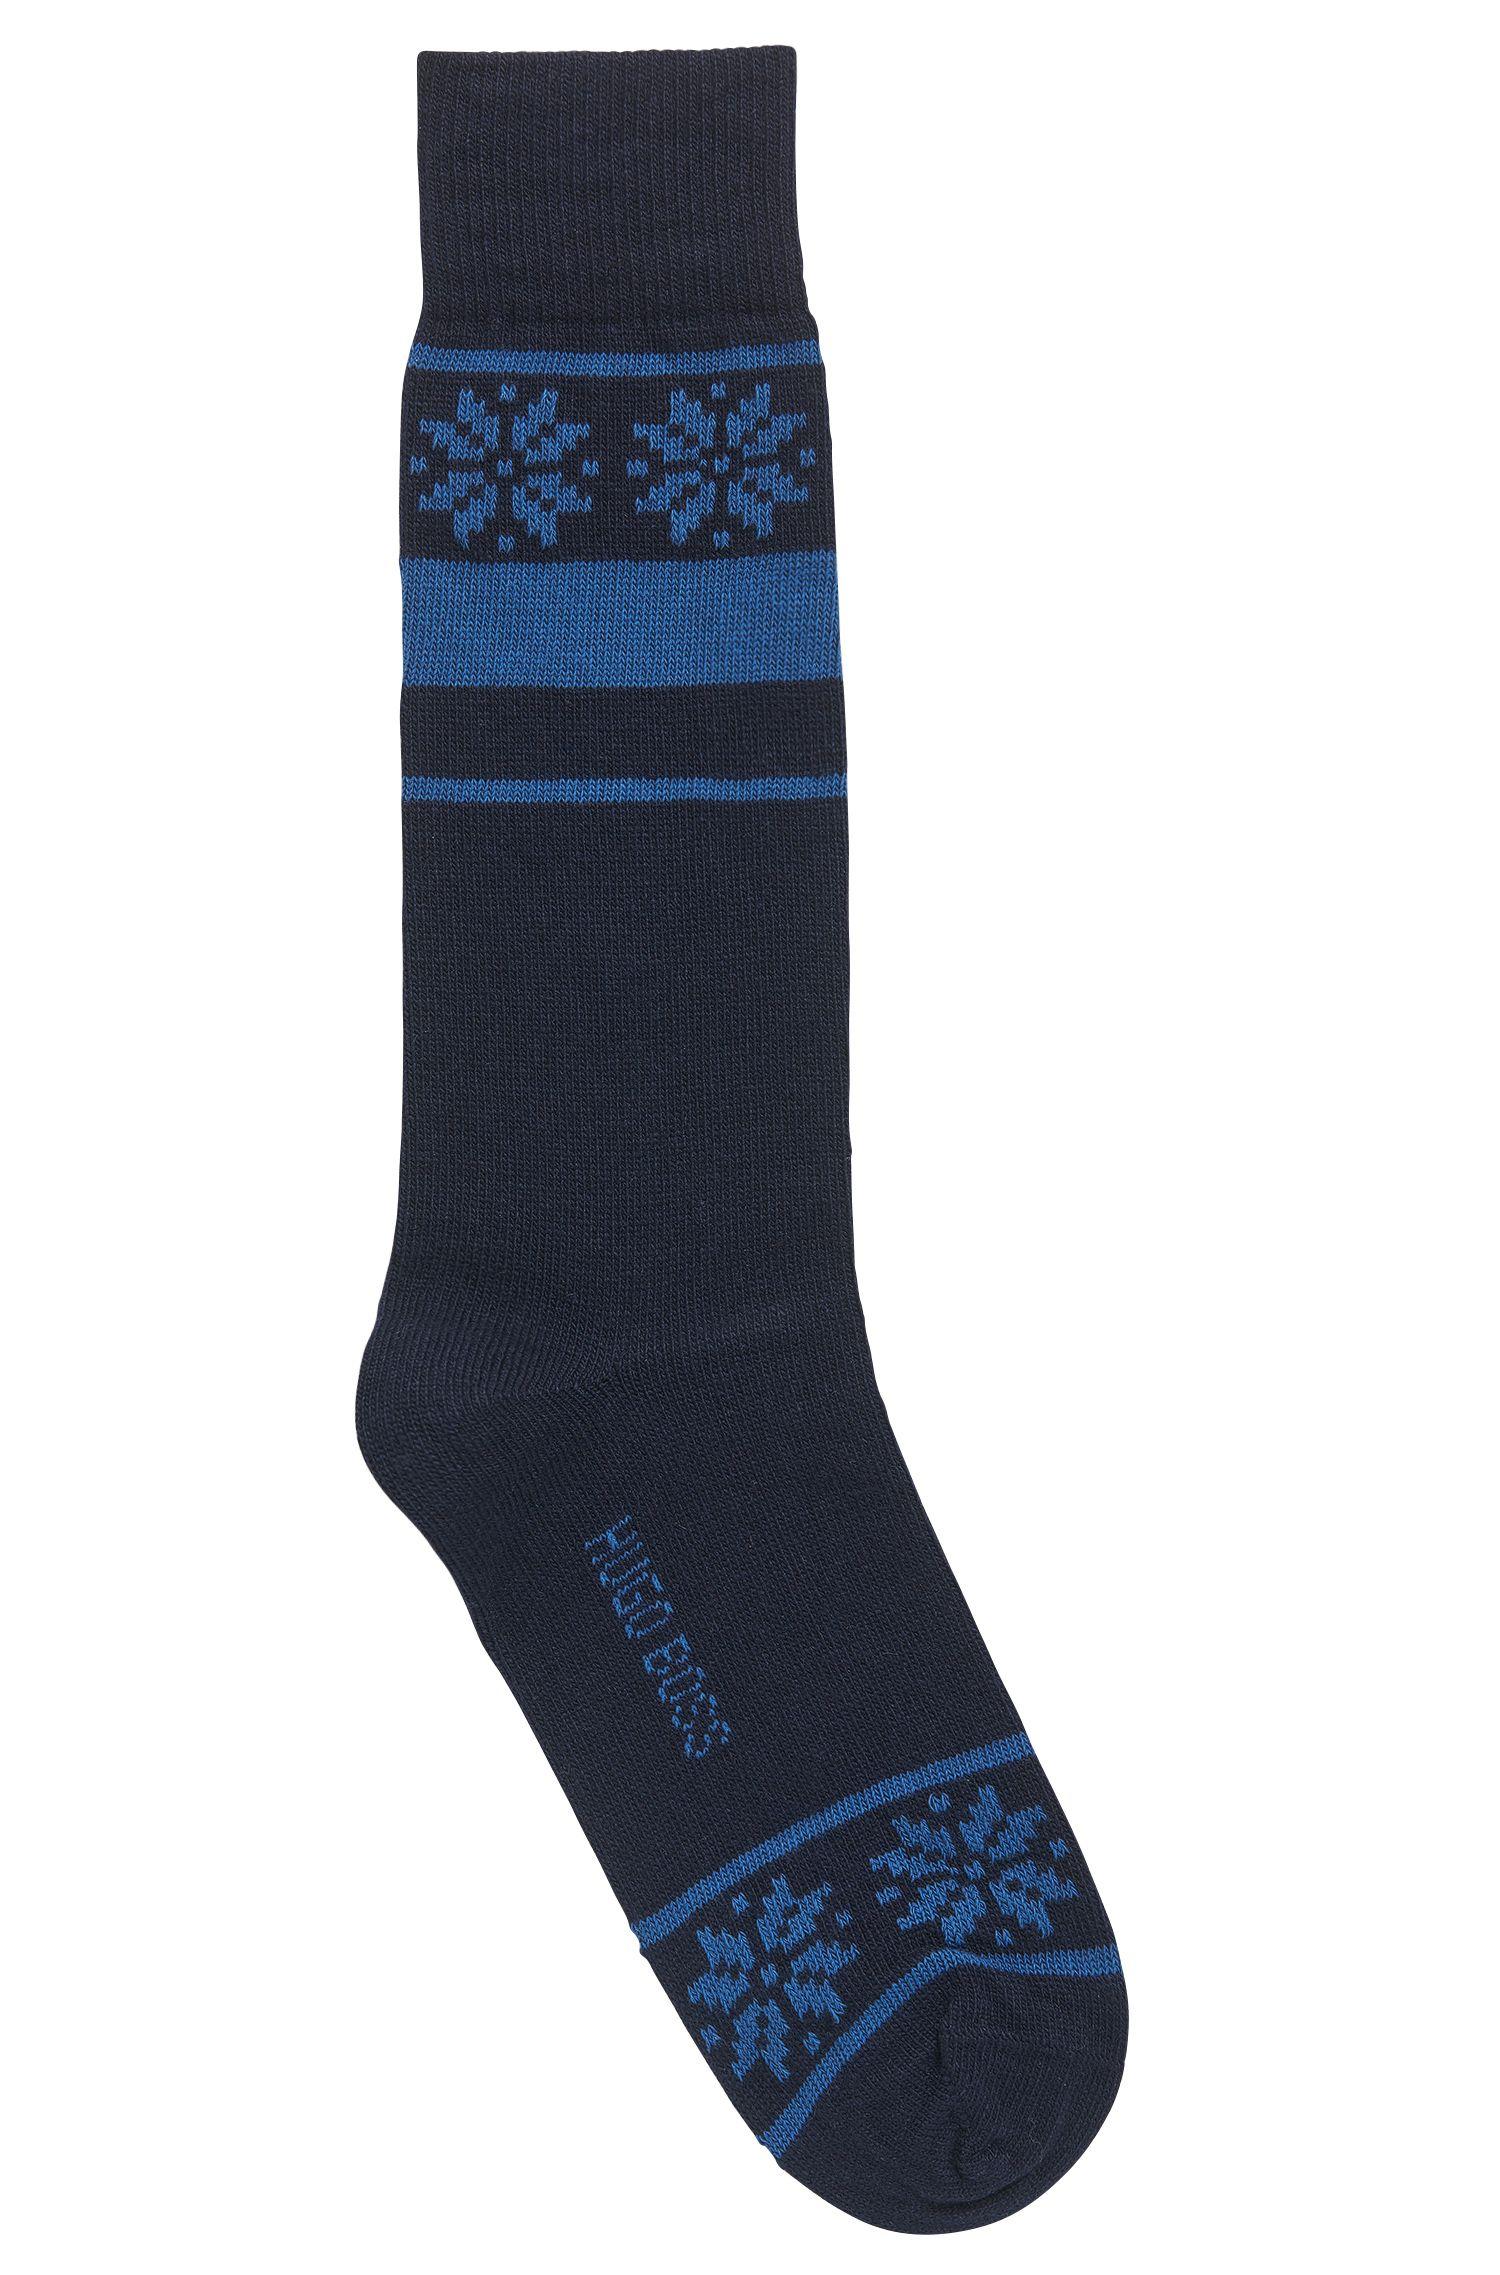 Mittelhohe Socken aus strapazierfähigem Material-Mix